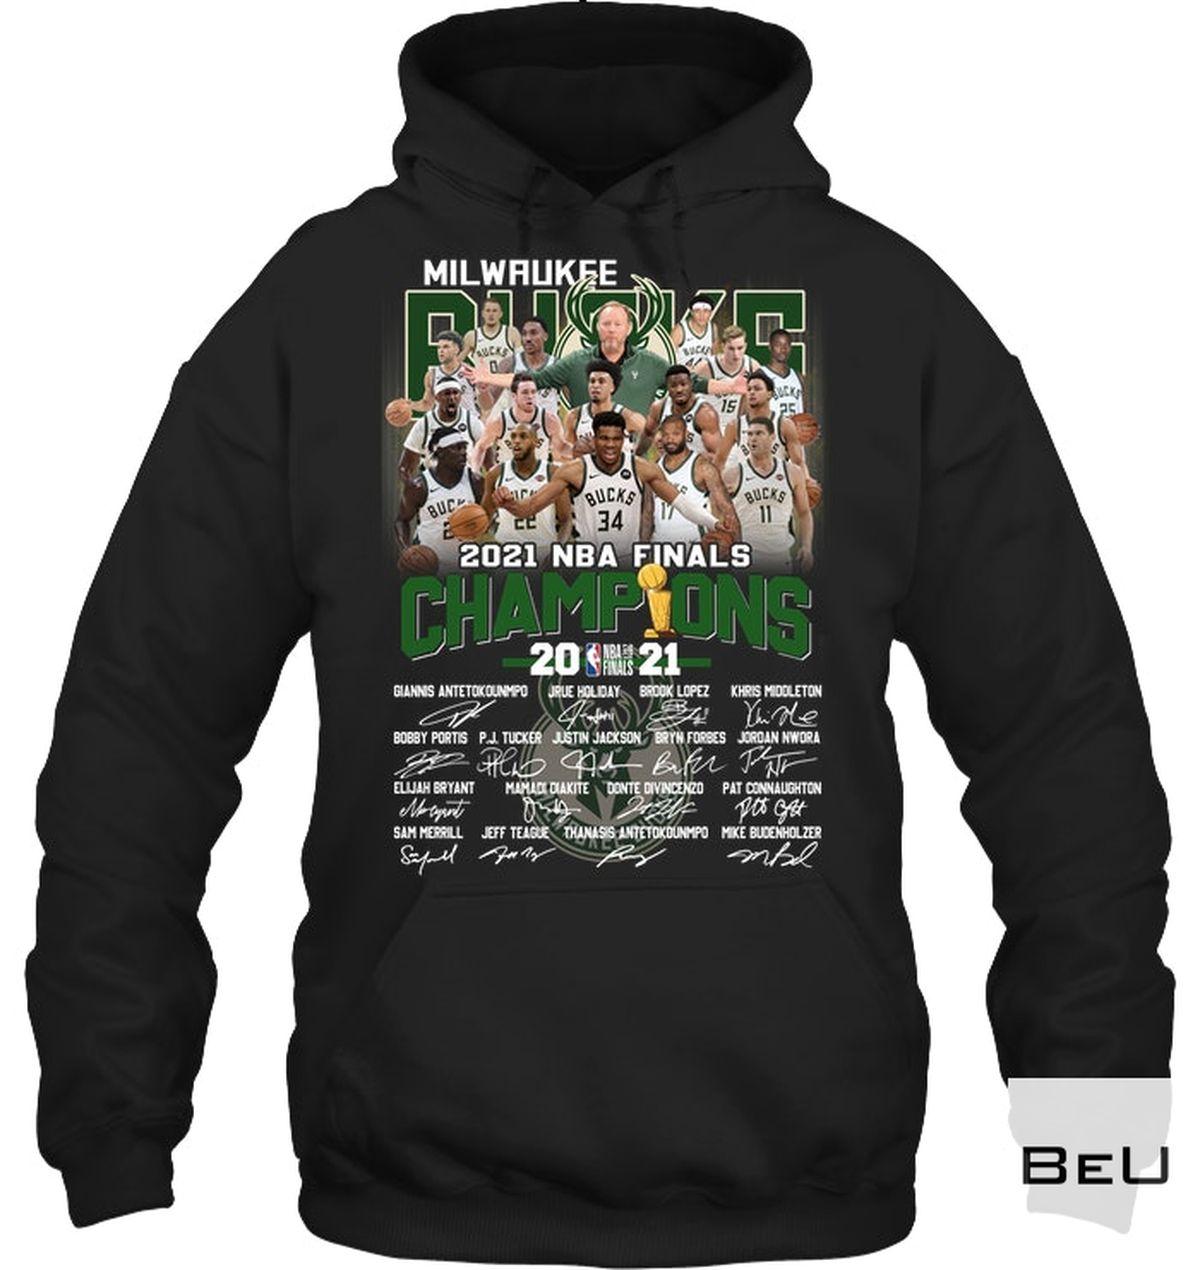 Unisex Milwaukee Brewers 2021 Nba Final Champion Shirt